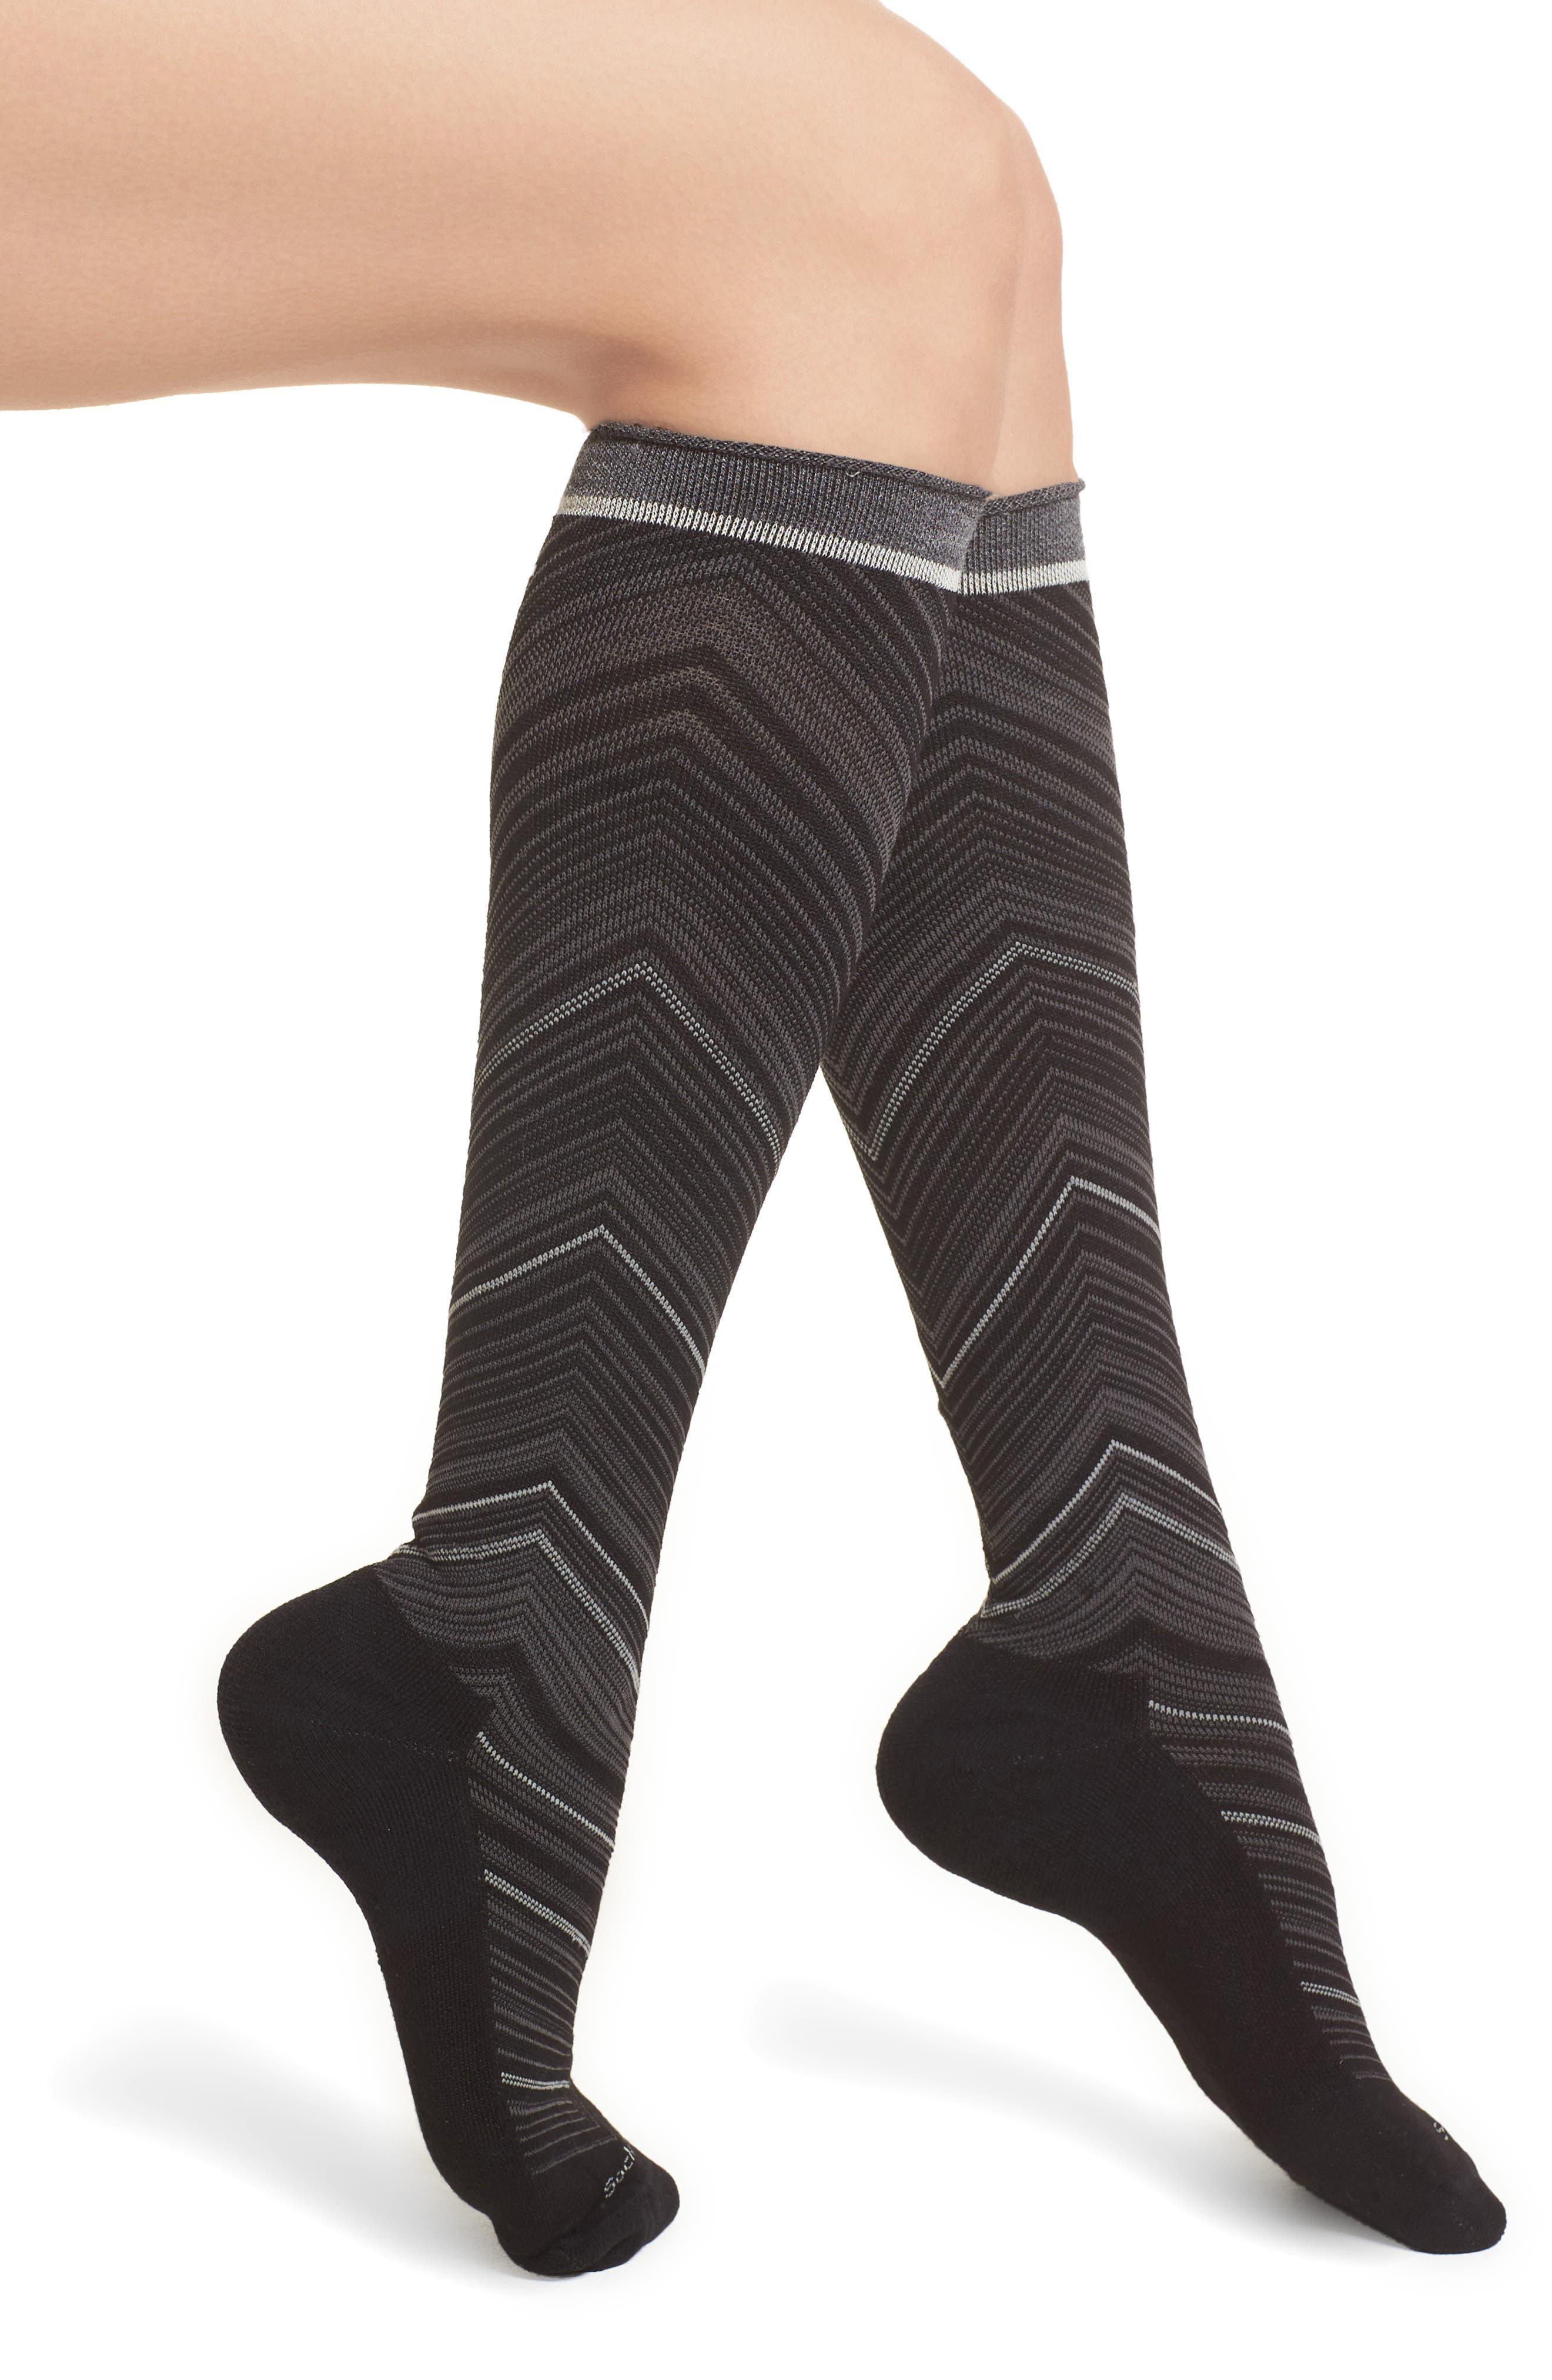 Full Calf Flattery Compression Socks,                             Main thumbnail 1, color,                             Black